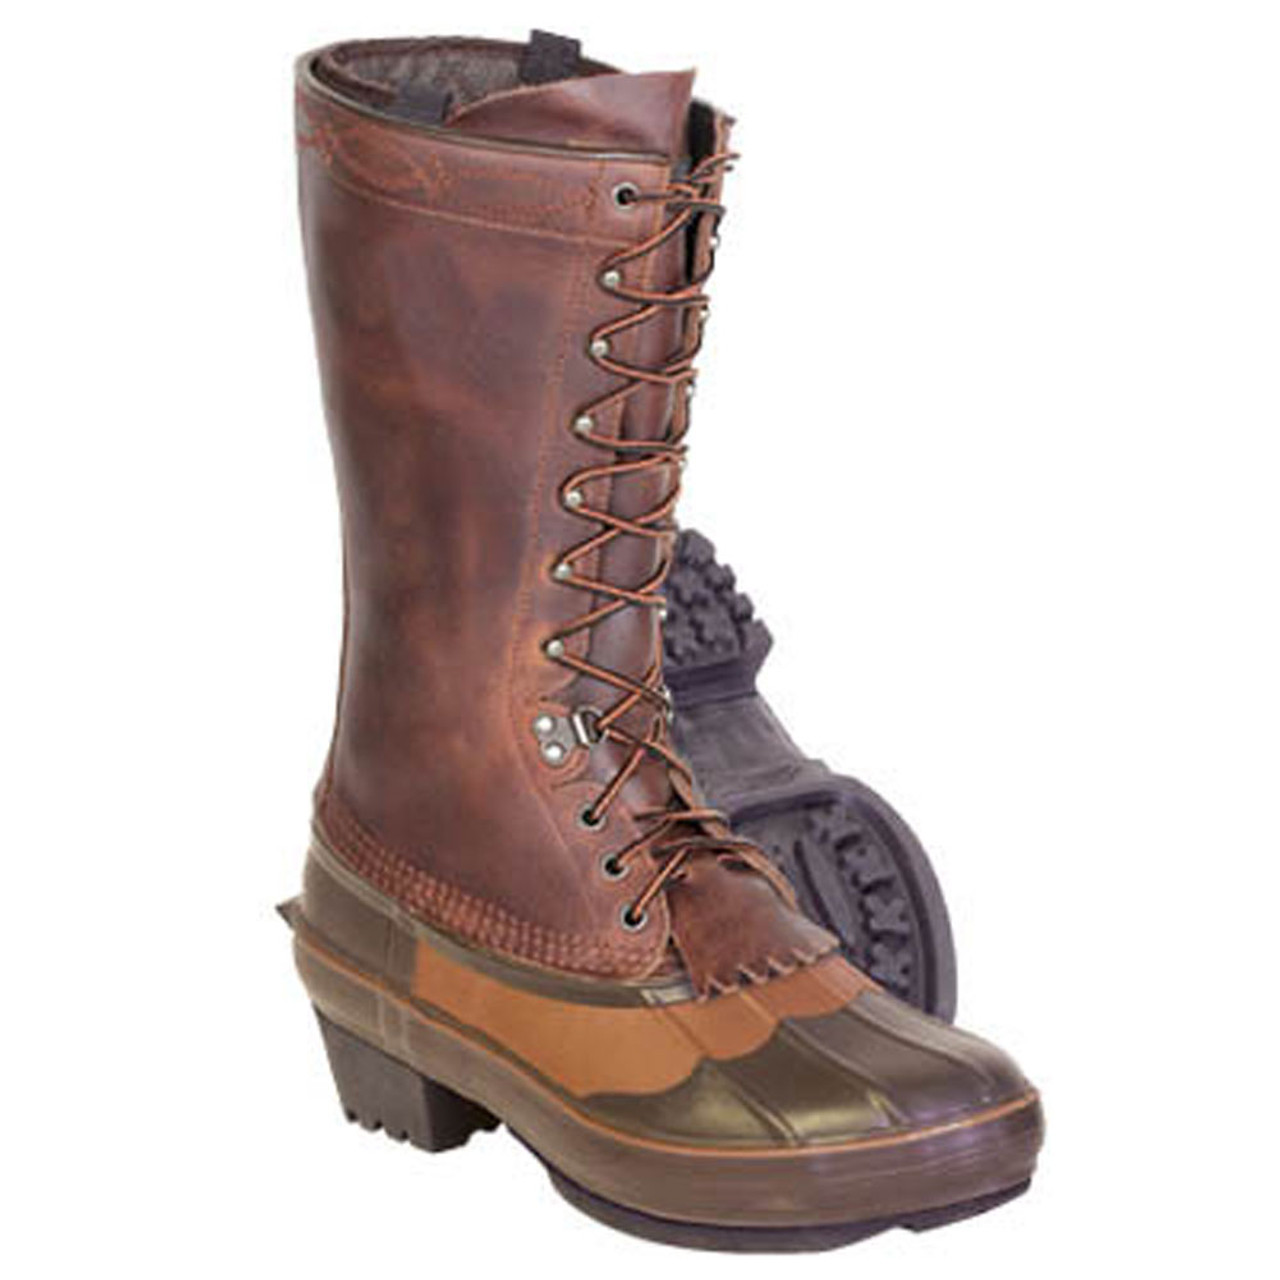 4313d6bee60 KENETREK Cowboy Boots (KE-3429-K)